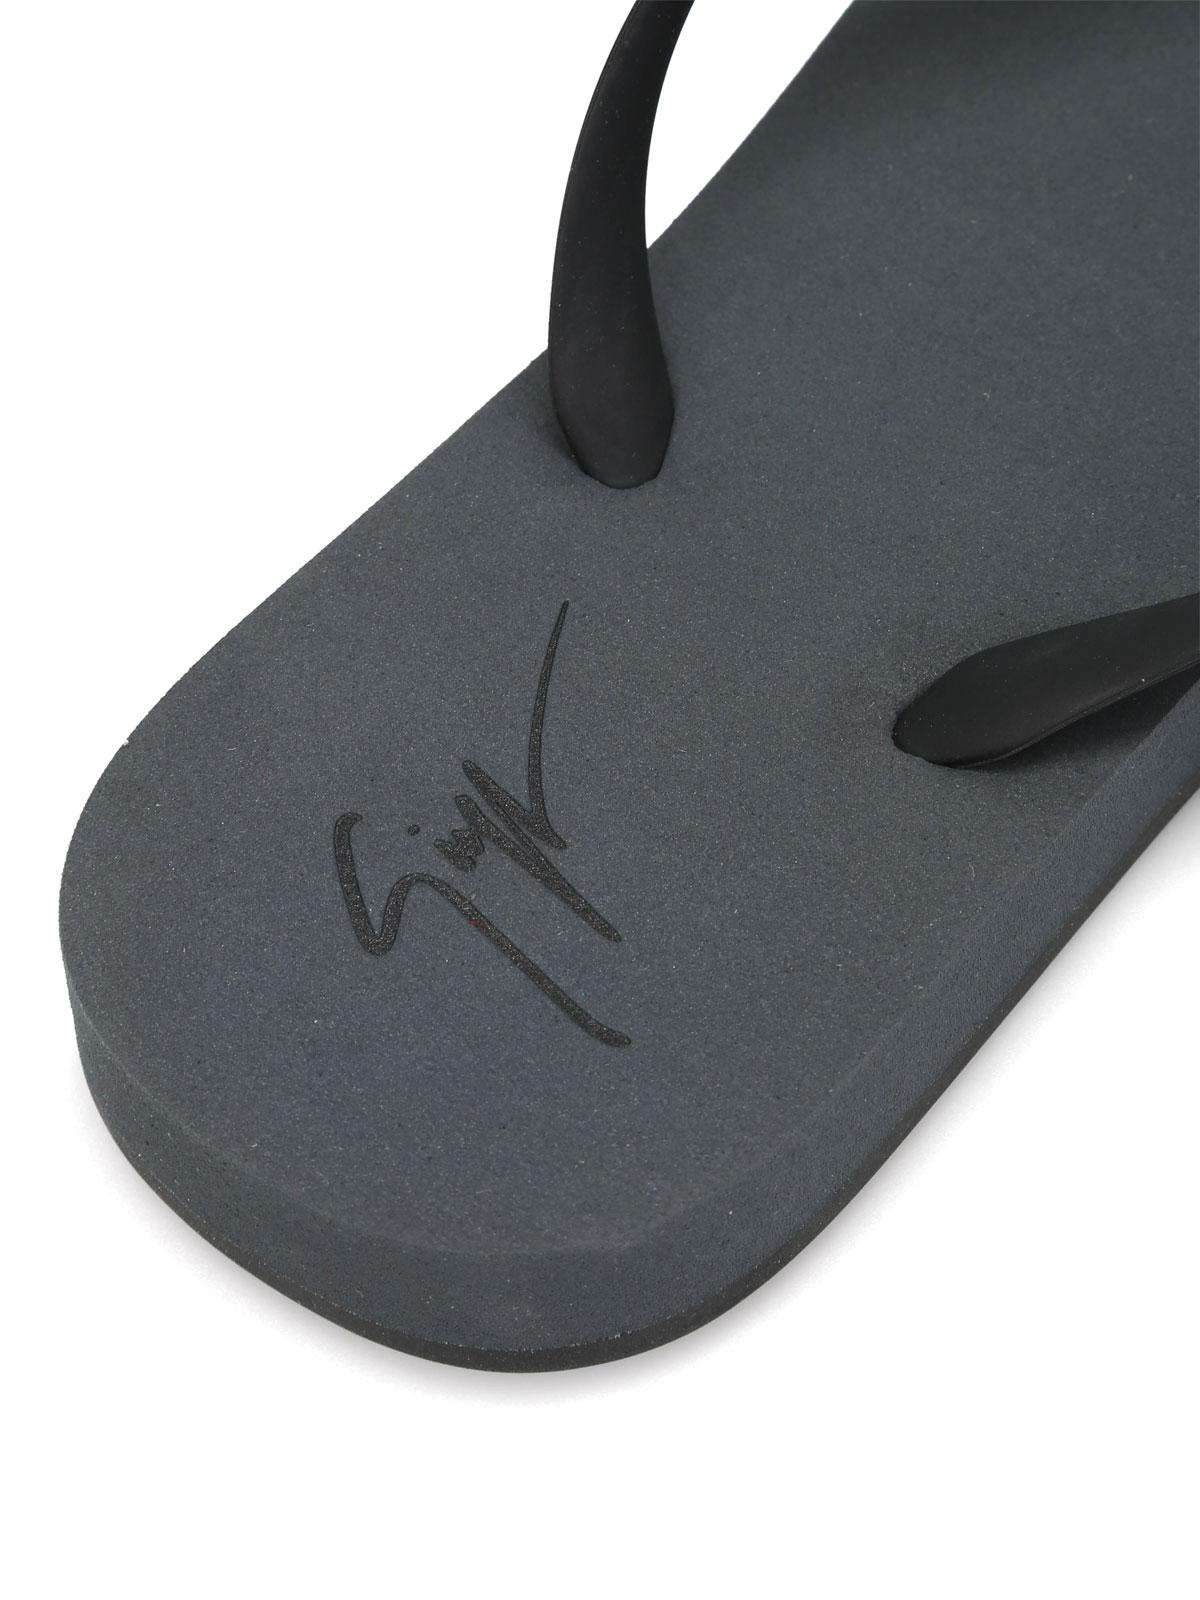 860df9d3d3ad1 Giuseppe Zanotti - Sunset chain detail flip flops - flip flops ...